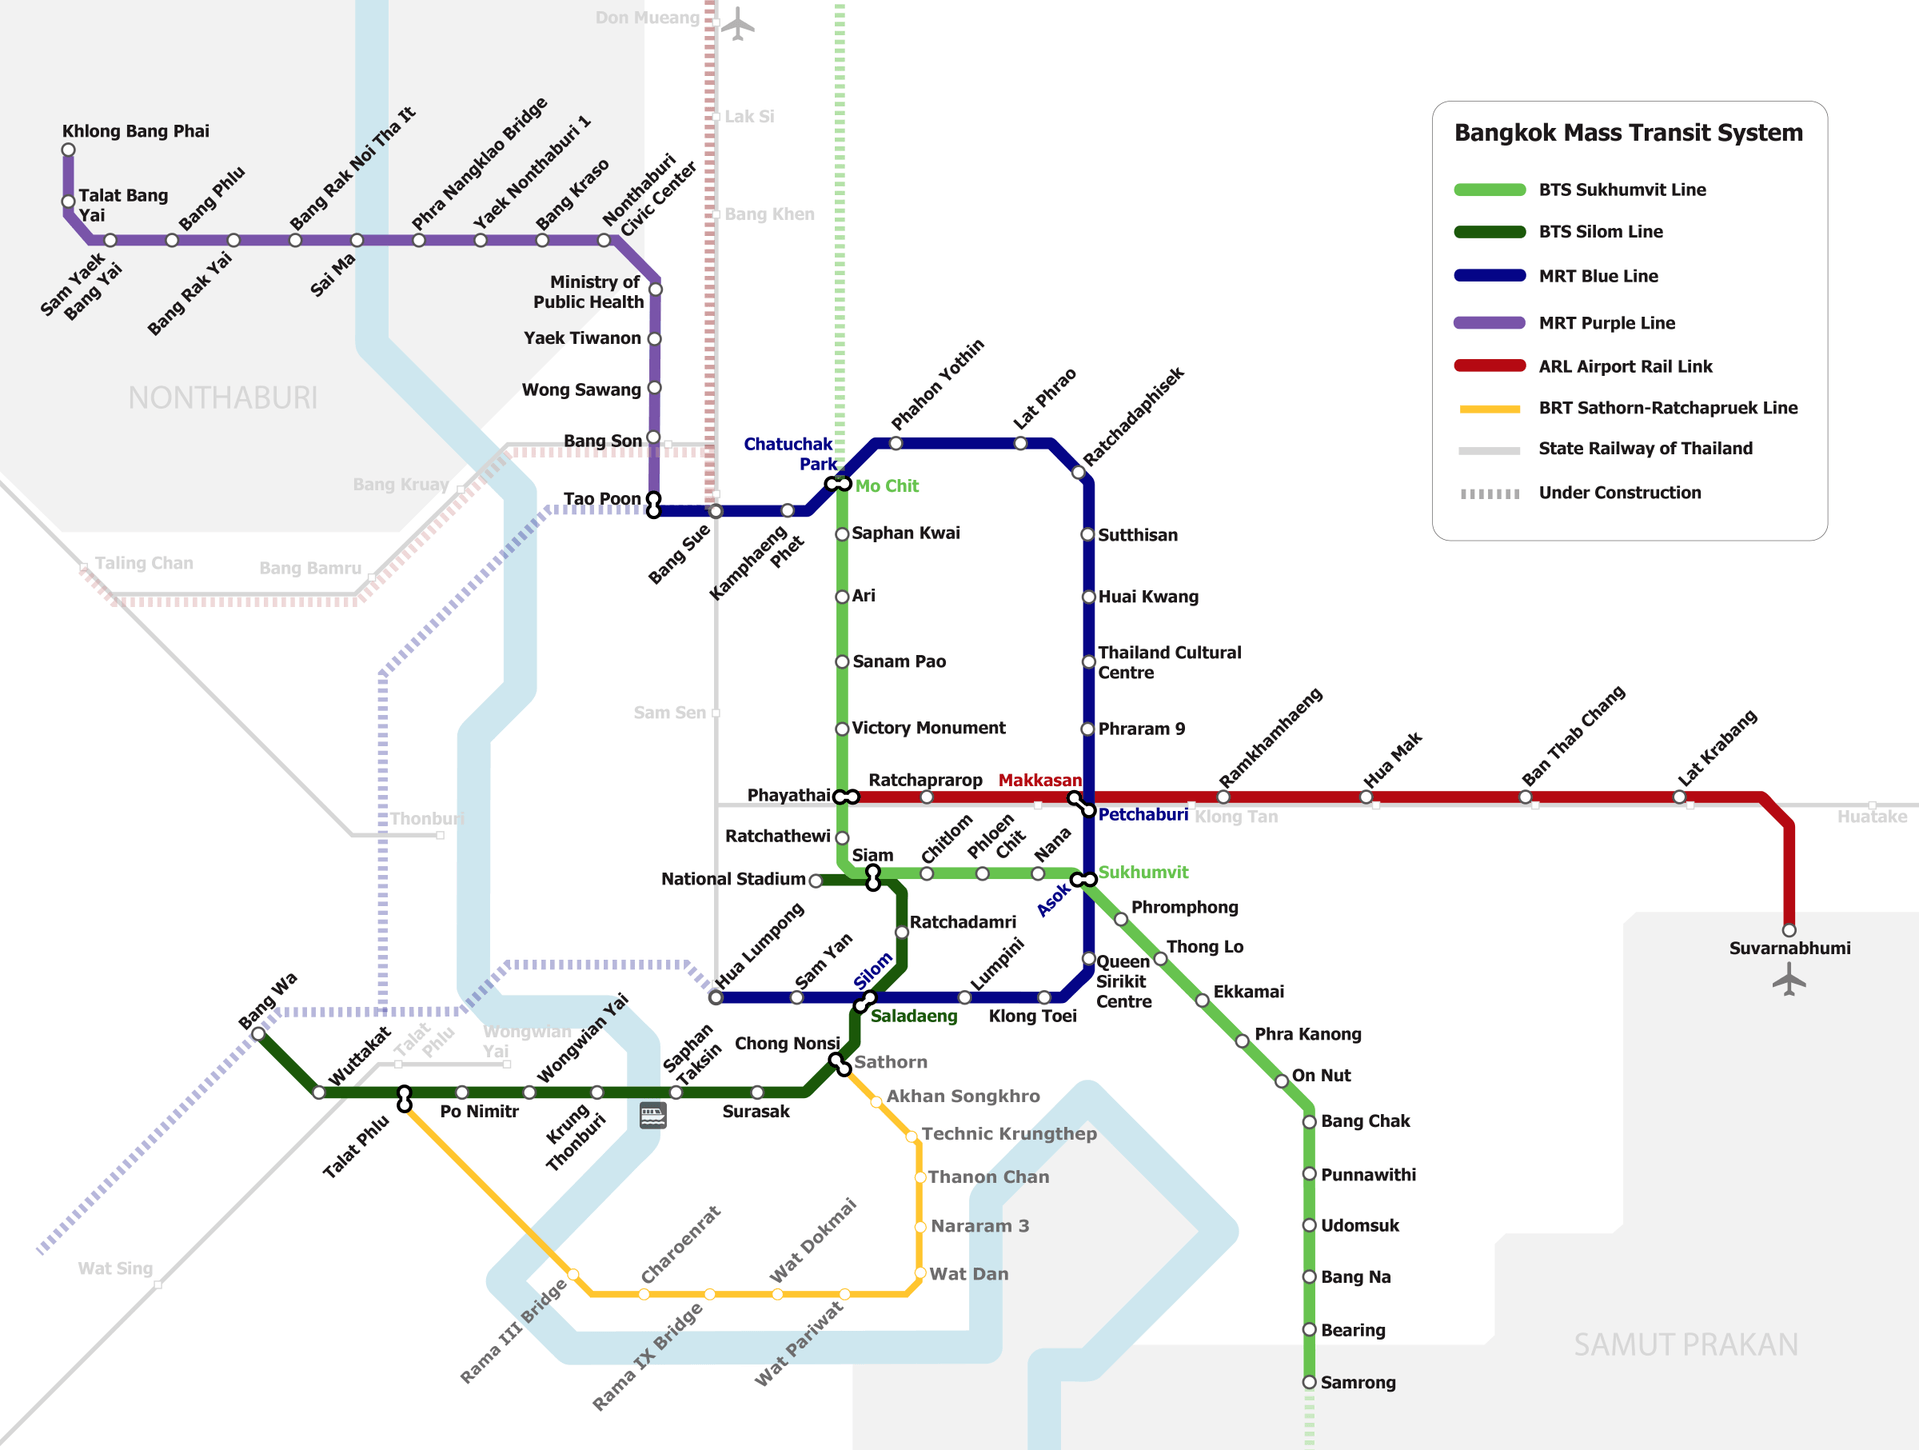 How to get around Bangkok - Public Transportation Map